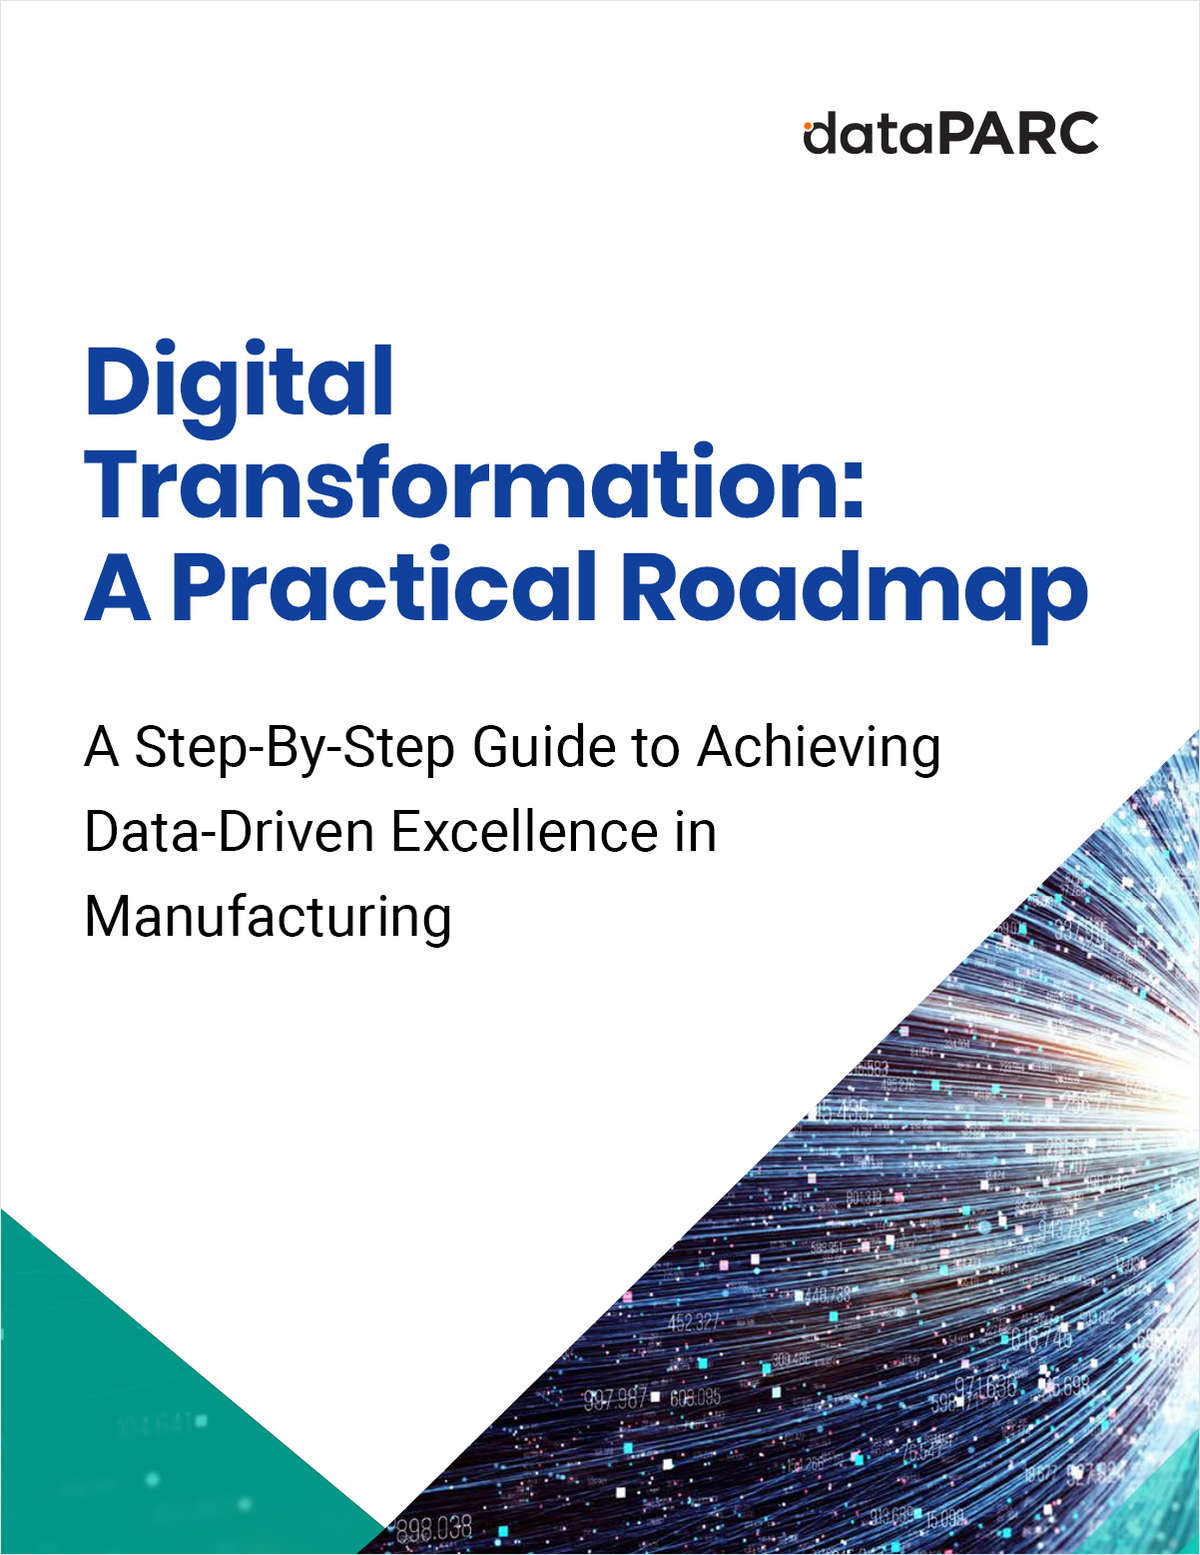 Digital Transformation: A Practical Roadmap